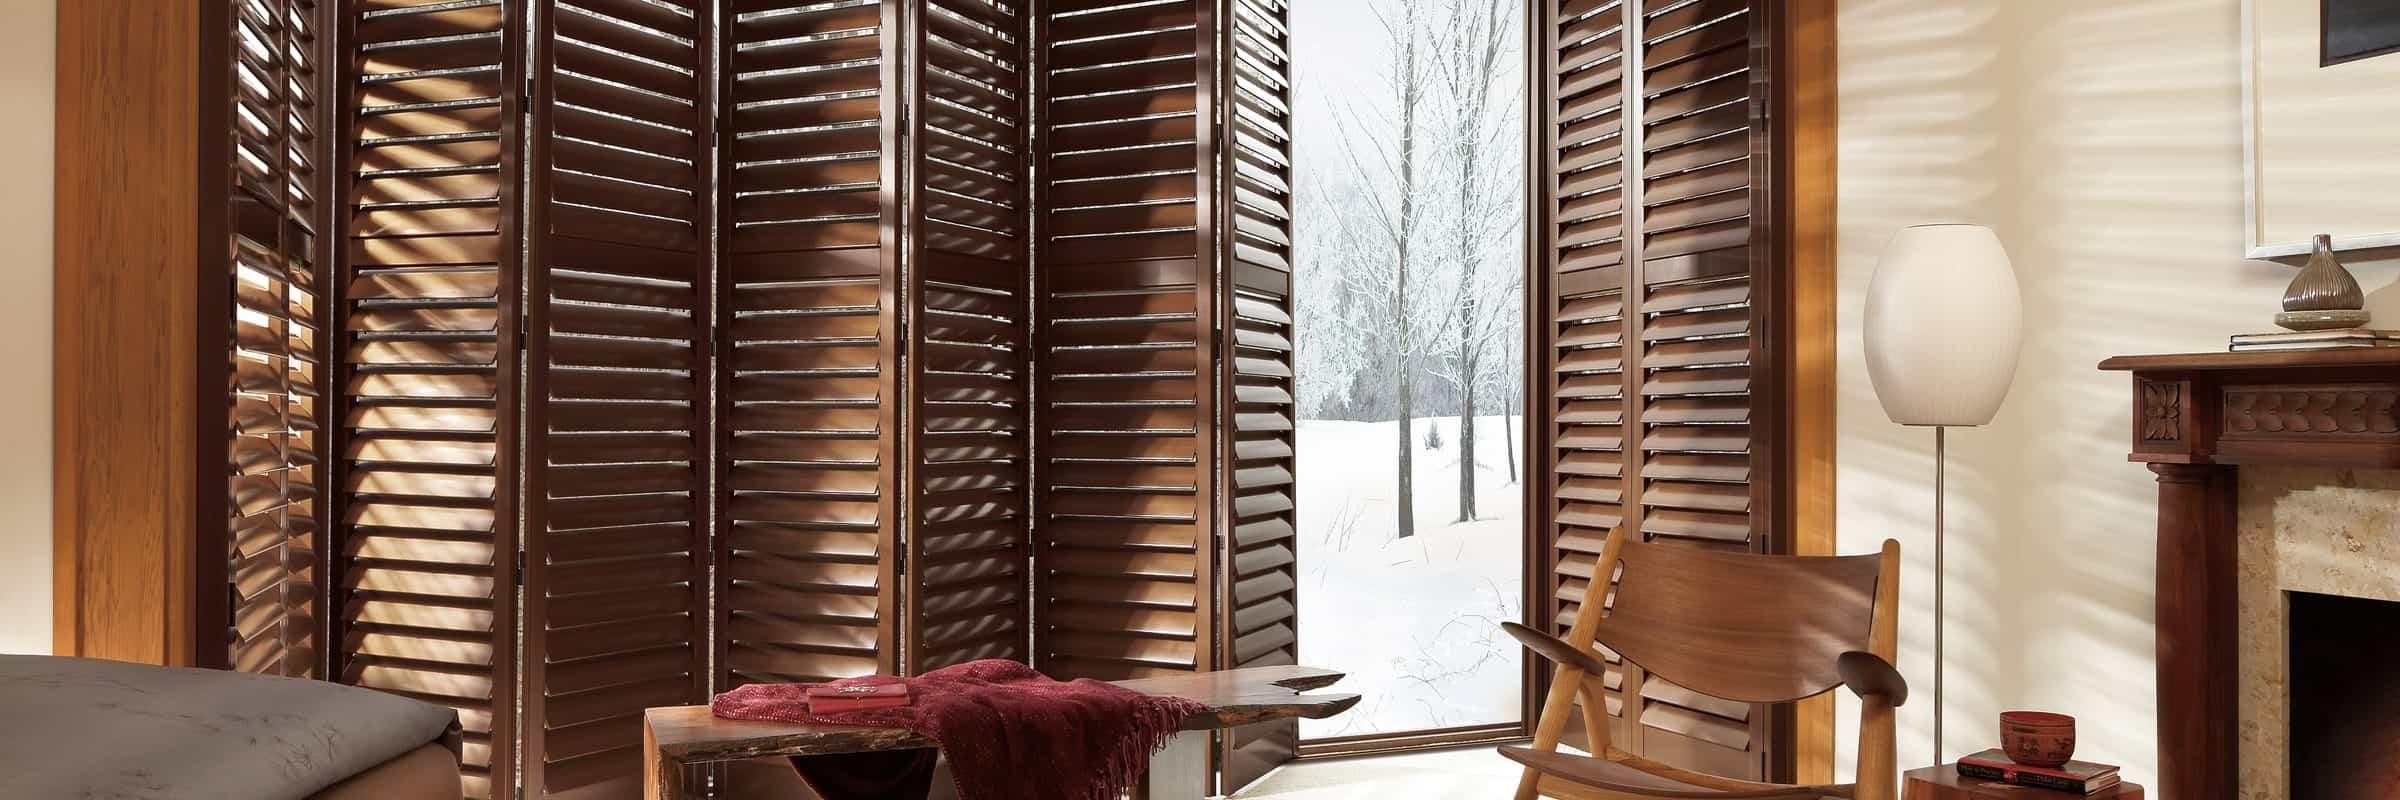 hybrid-interior-shutters-newstyle-carousel-05